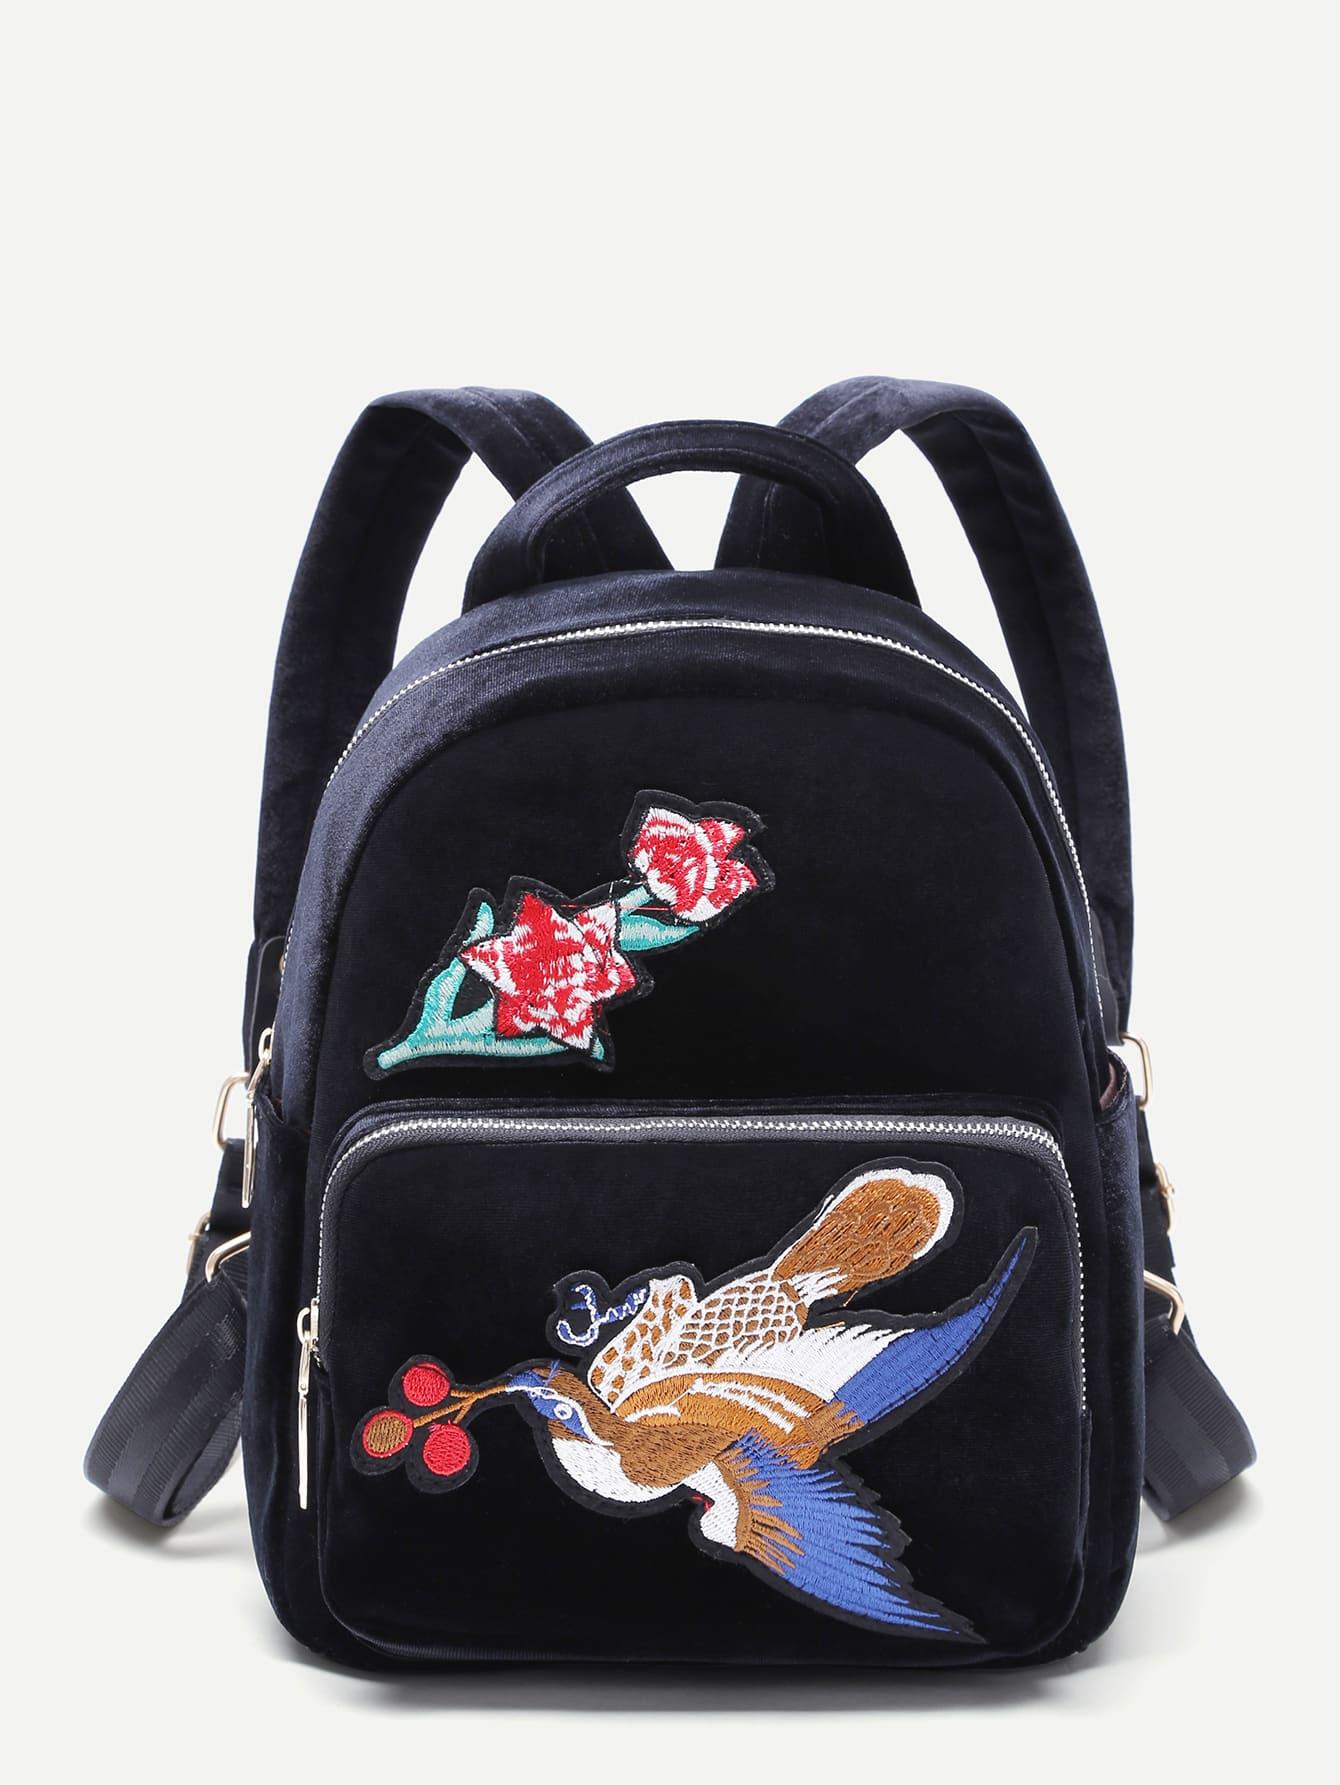 bag161209903_2